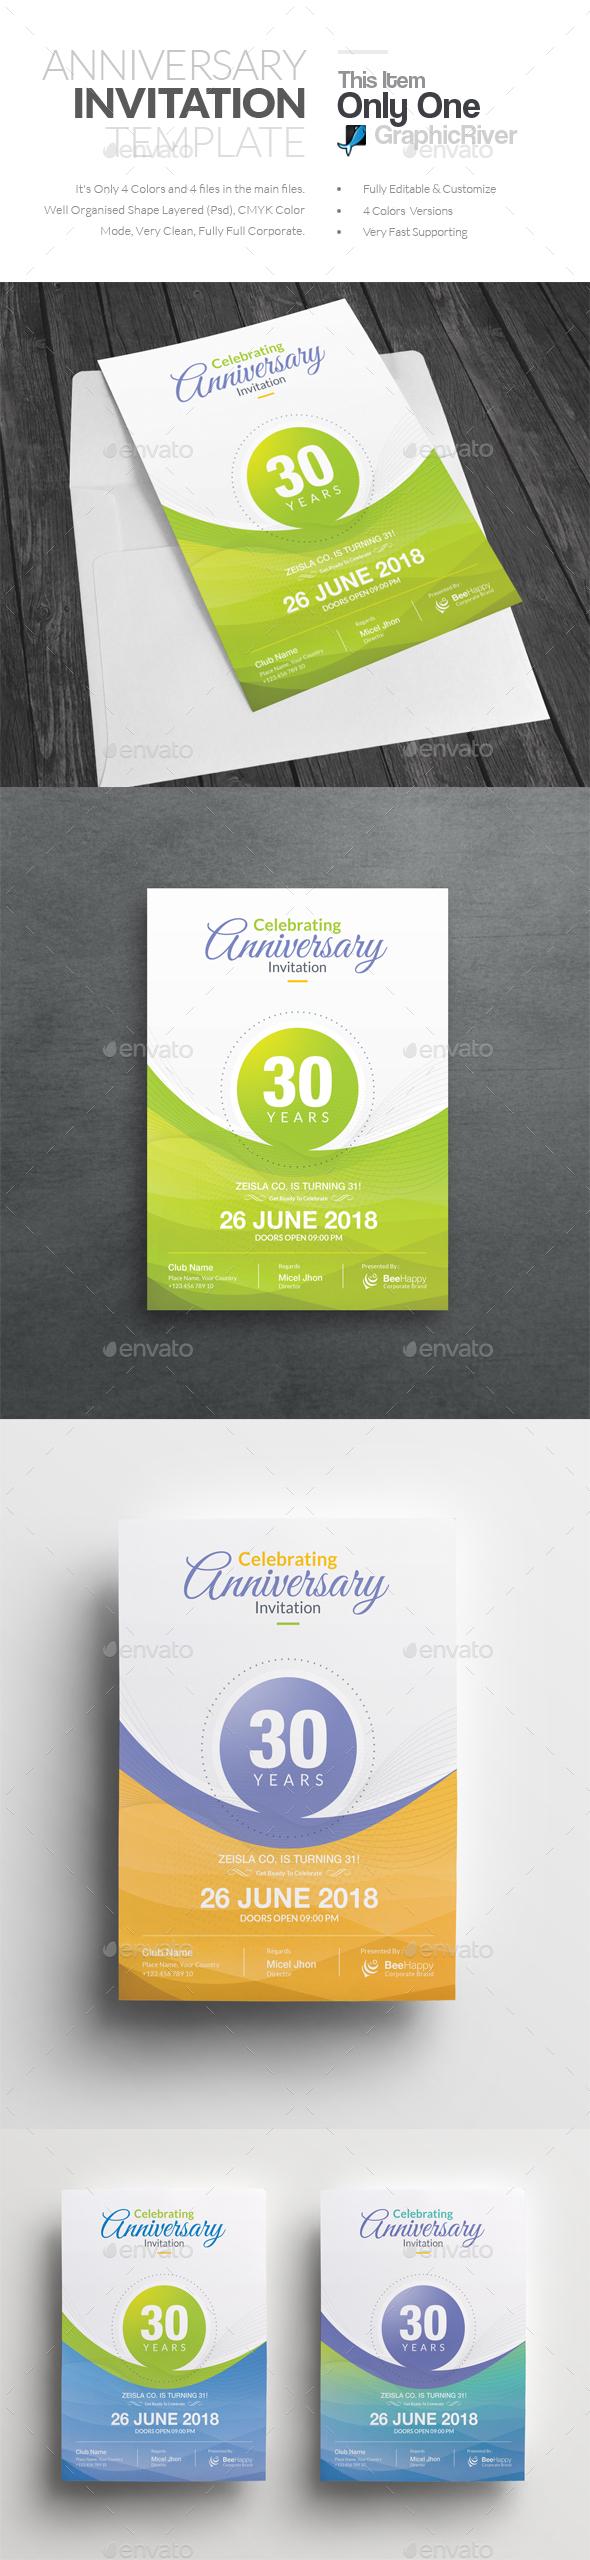 Anniversary Invitation - Anniversary Greeting Cards